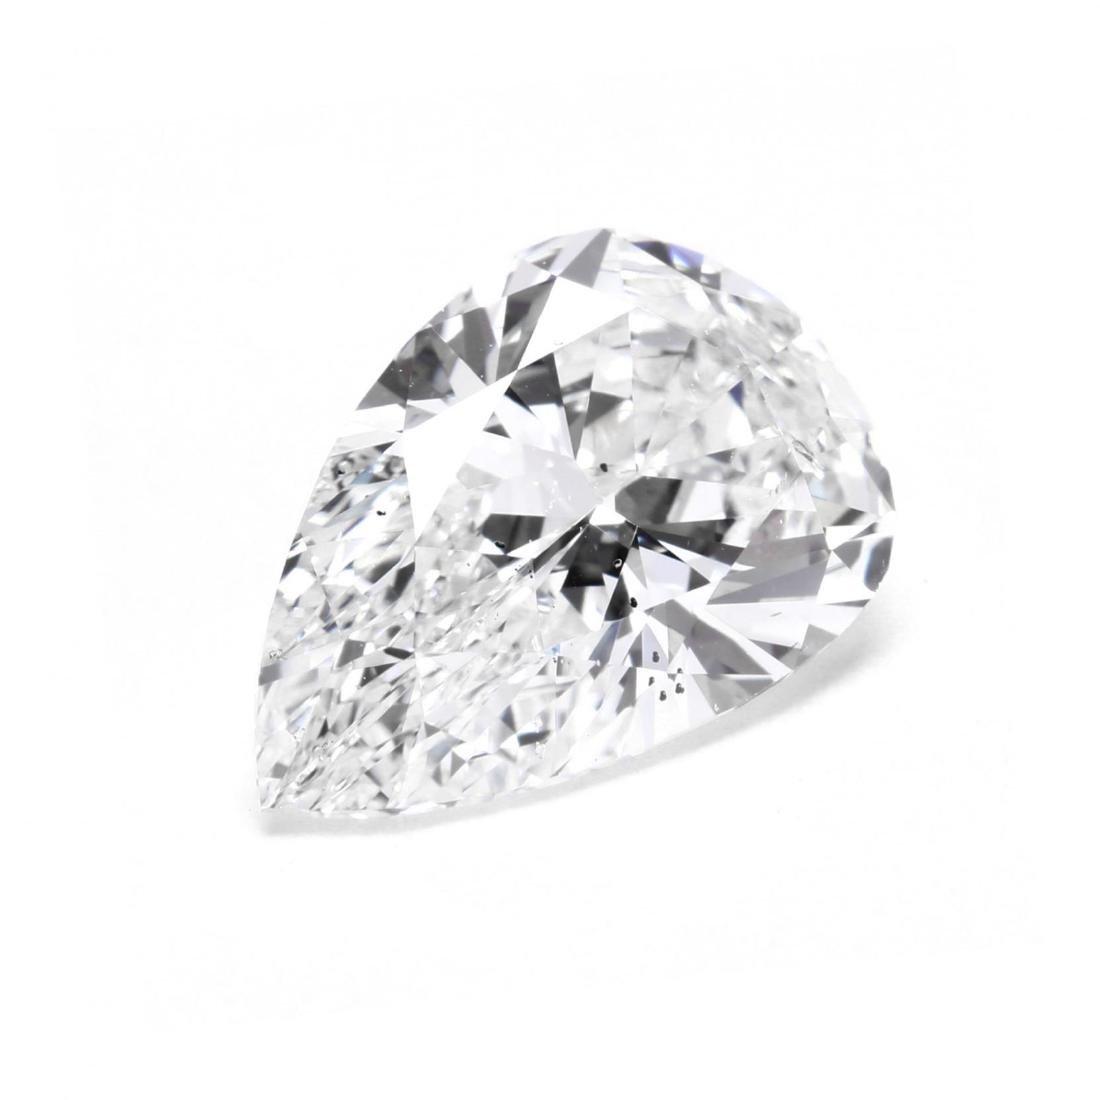 Unmounted Diamond with Platinum and Diamond Mount - 6